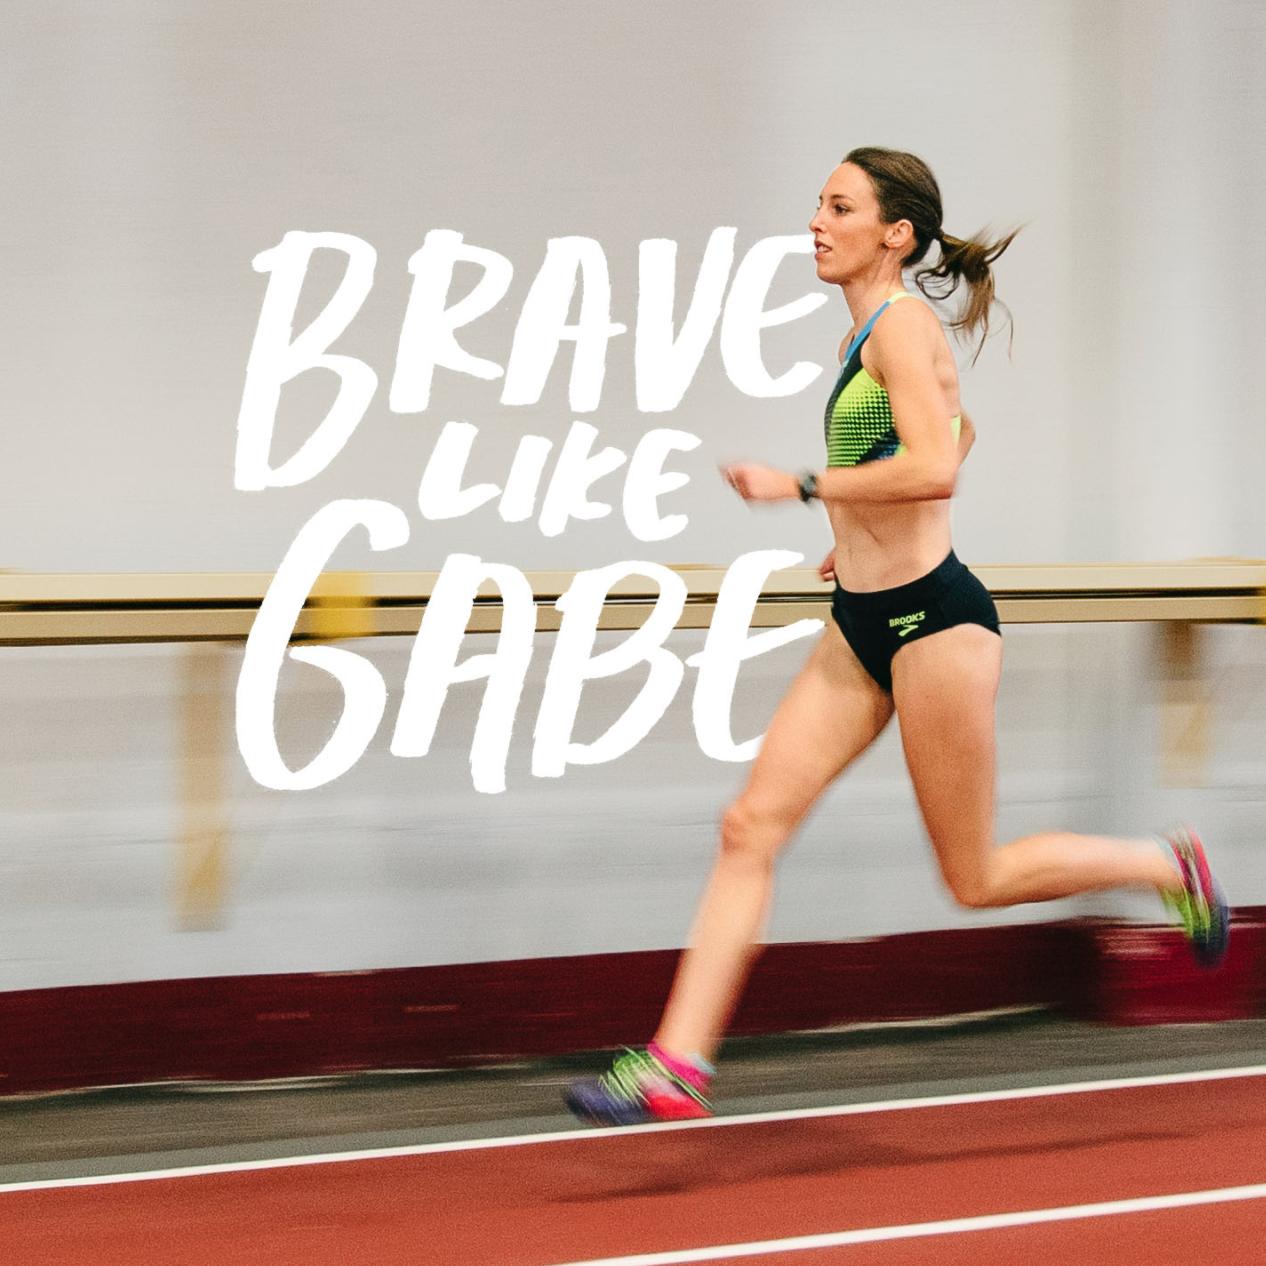 Pro runner. Cancer patient. Relentless optimist. - Brooks Running